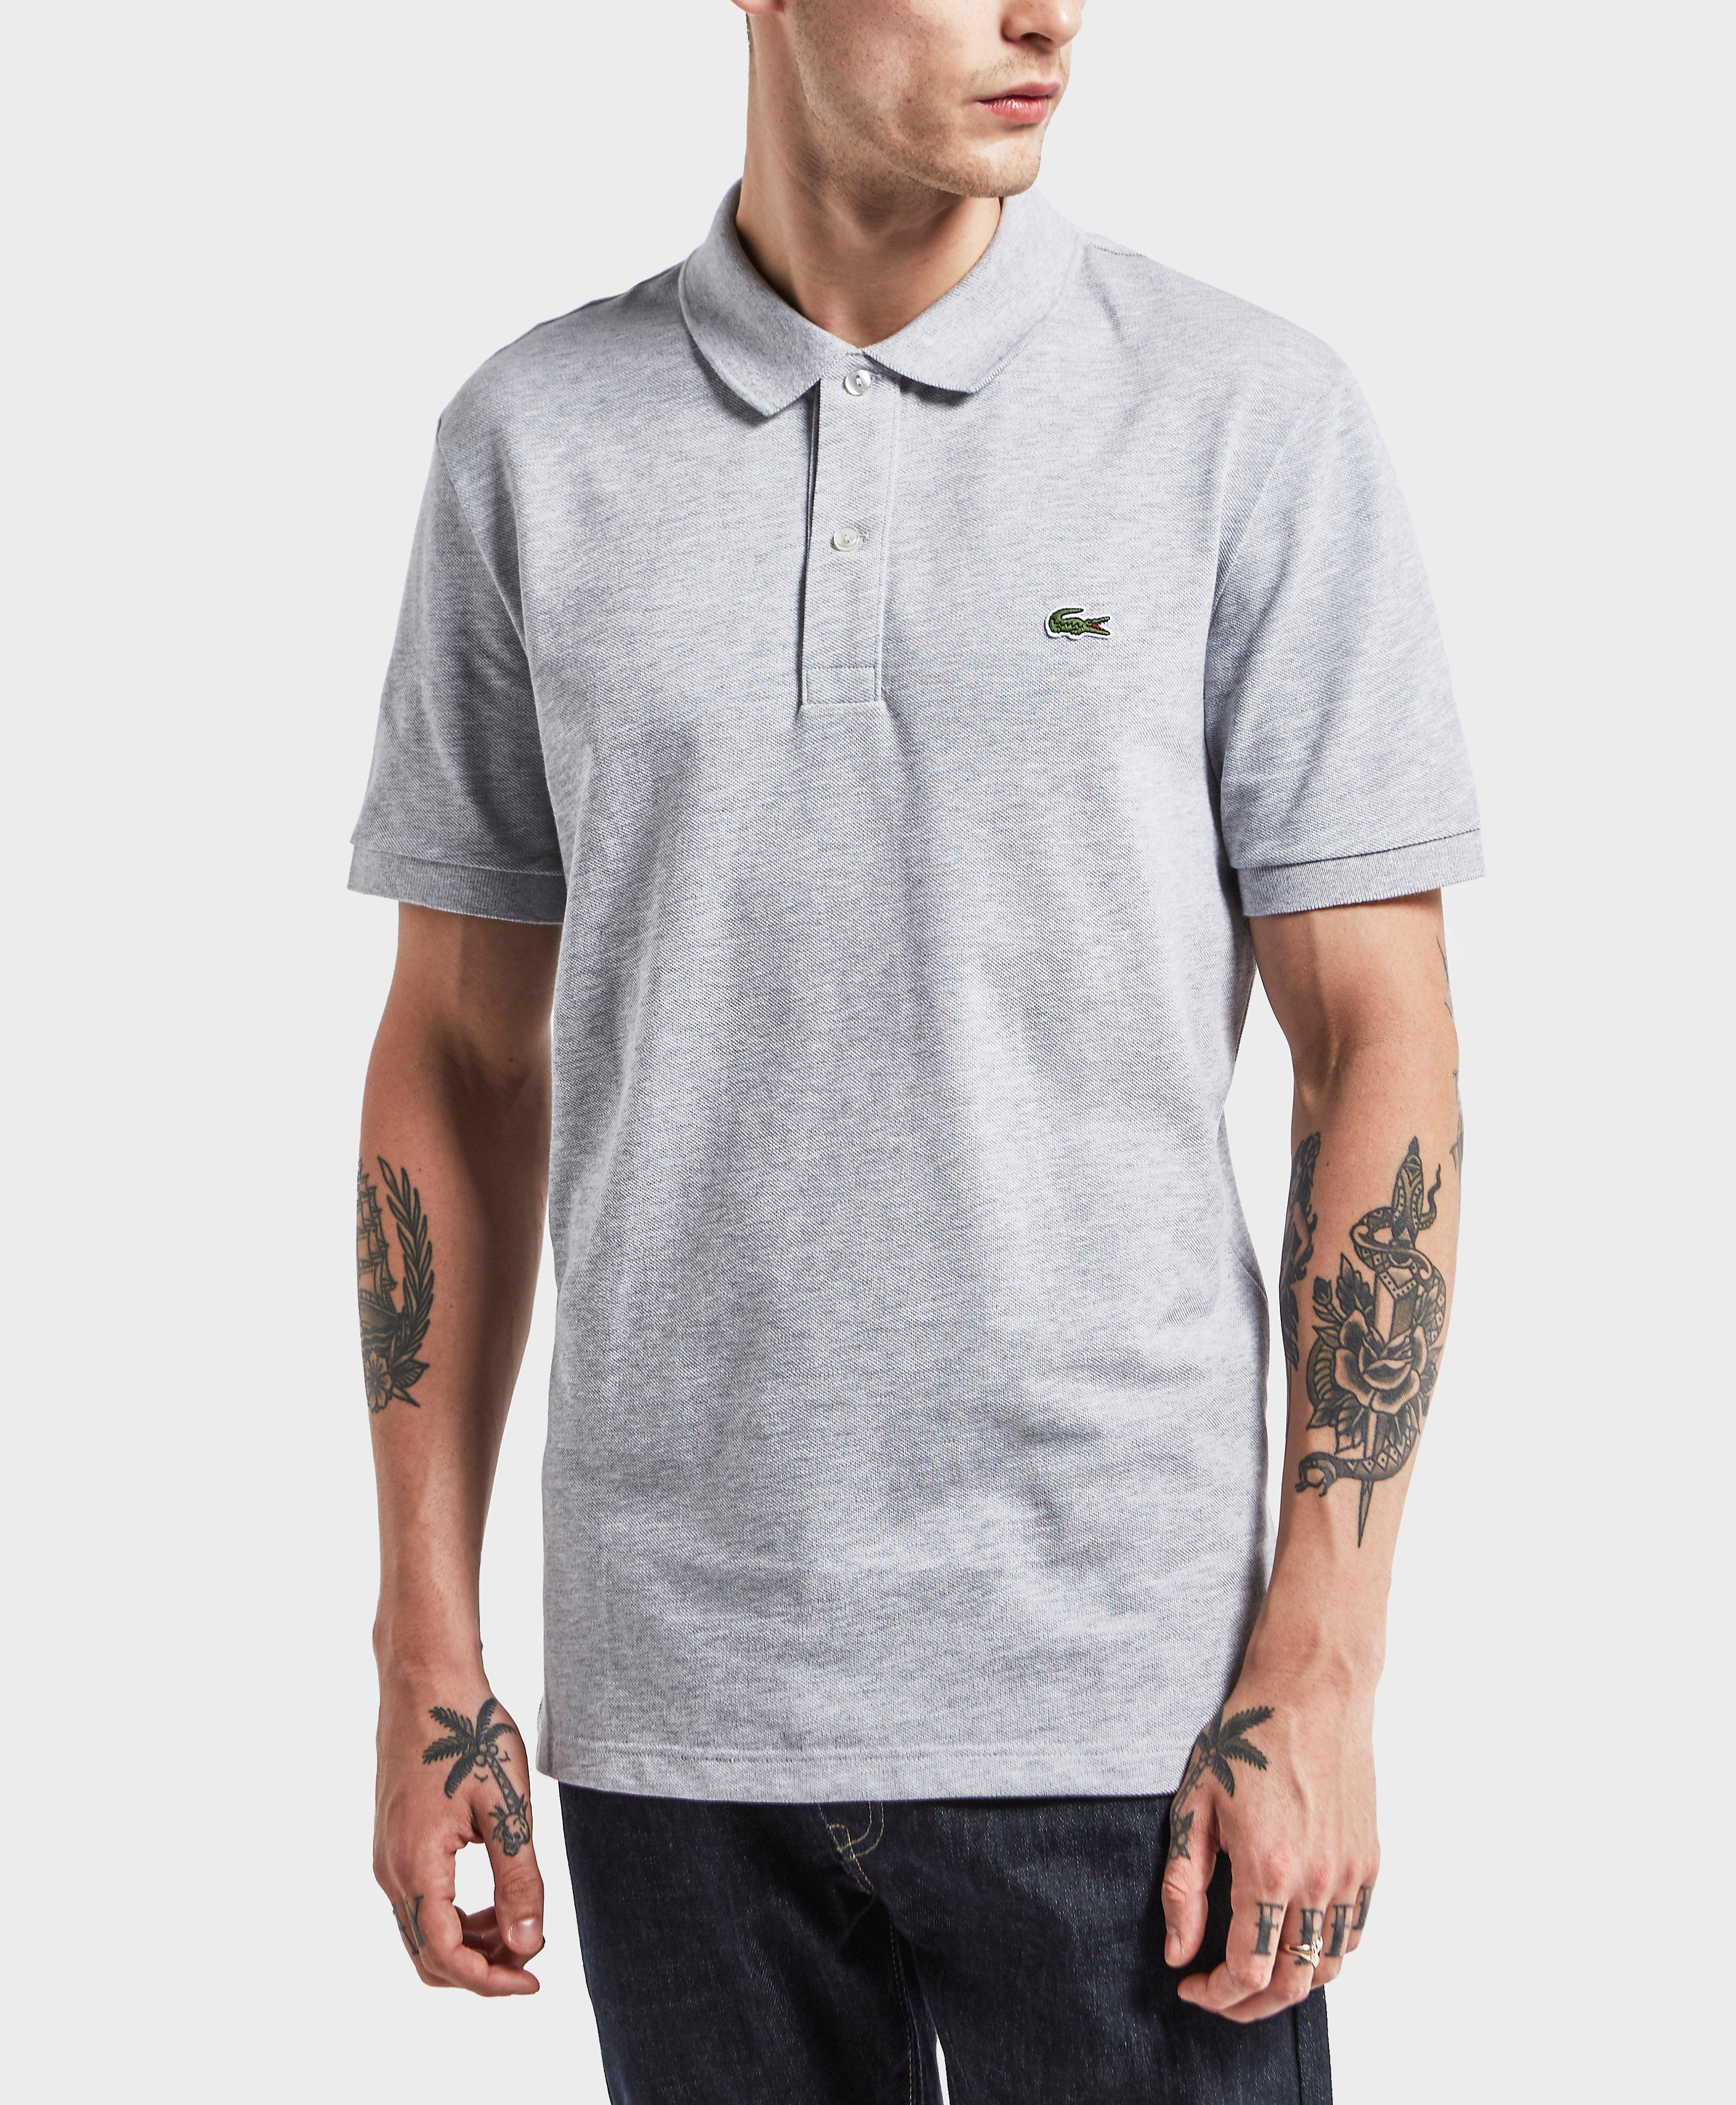 590d63ab0edff8 Lyst - Lacoste 1212 Slim Short Sleeve Polo Shirt in Gray for Men